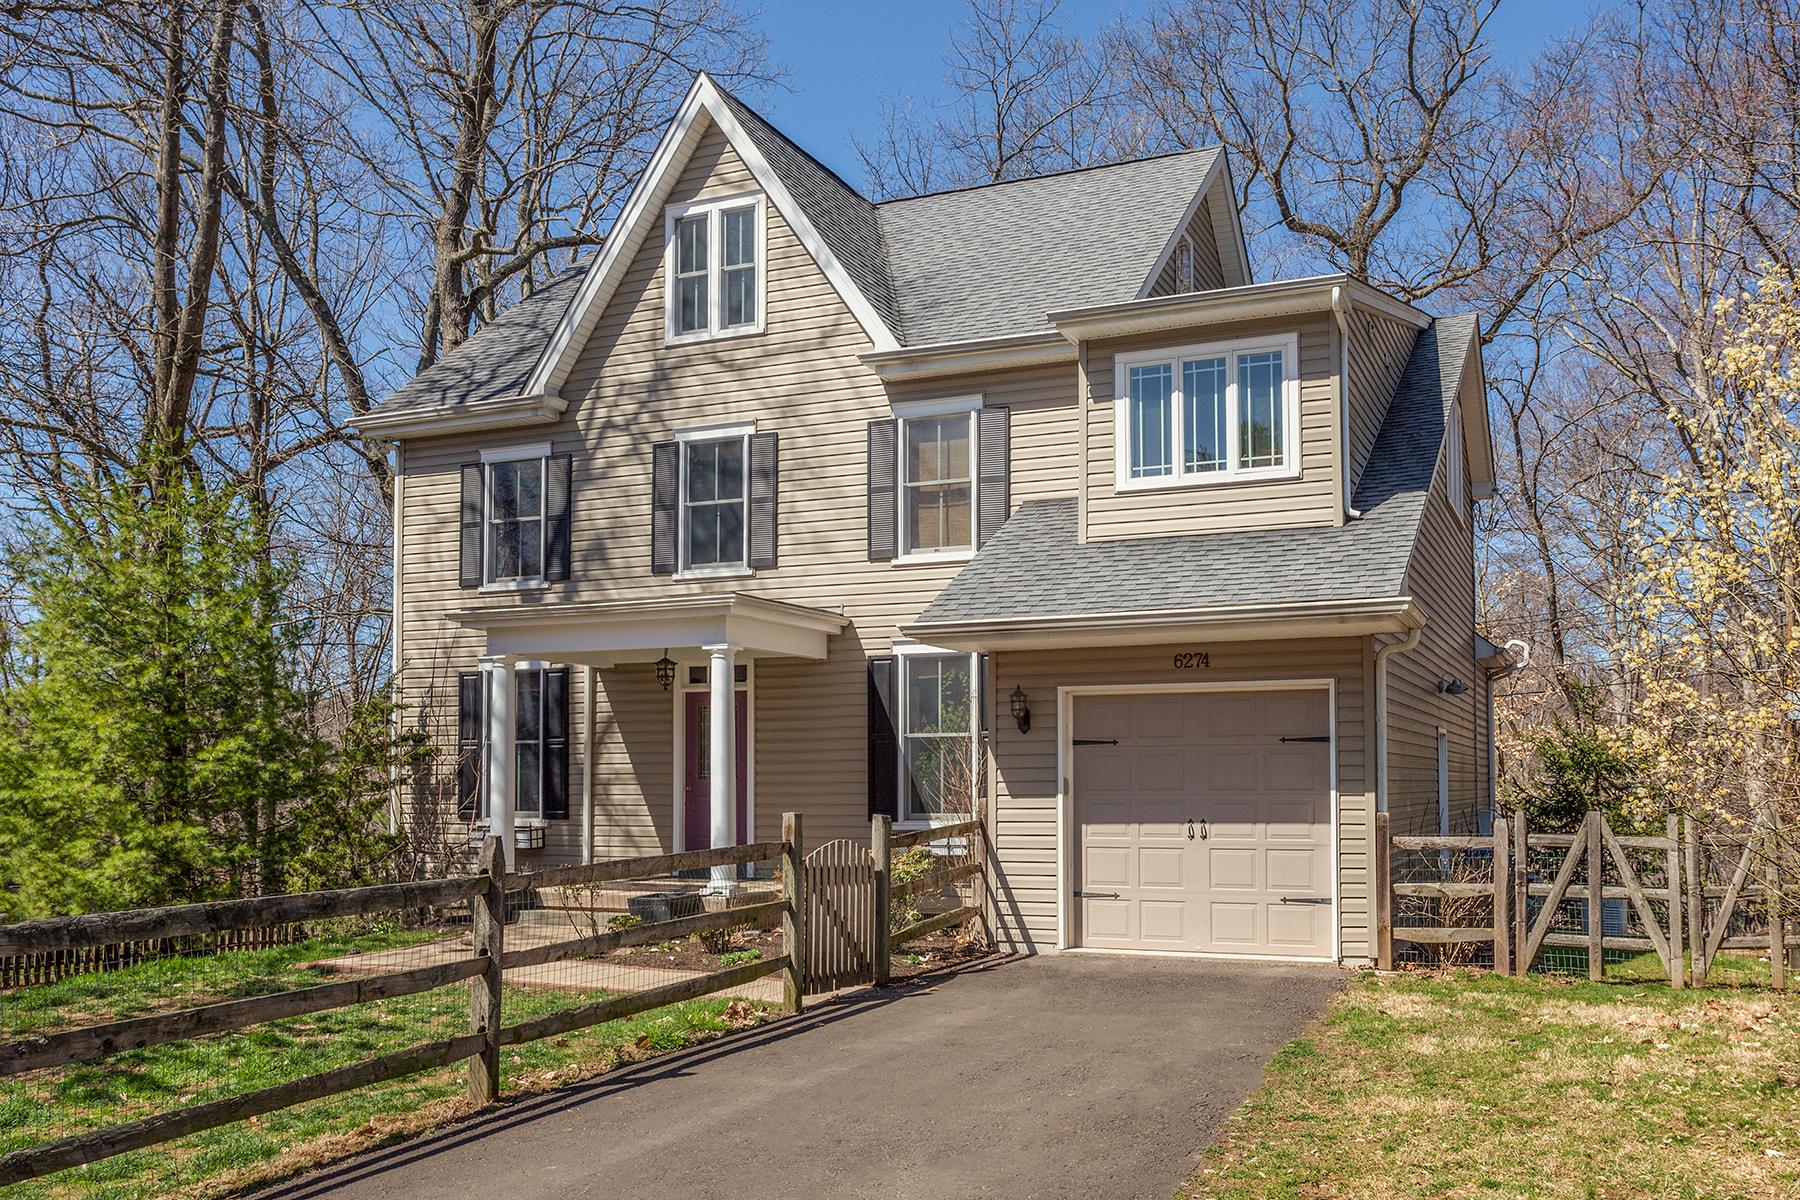 獨棟家庭住宅 為 出售 在 New Hope, PA 6274 Lower Mountain Rd New Hope, 賓夕法尼亞州, 18938 美國